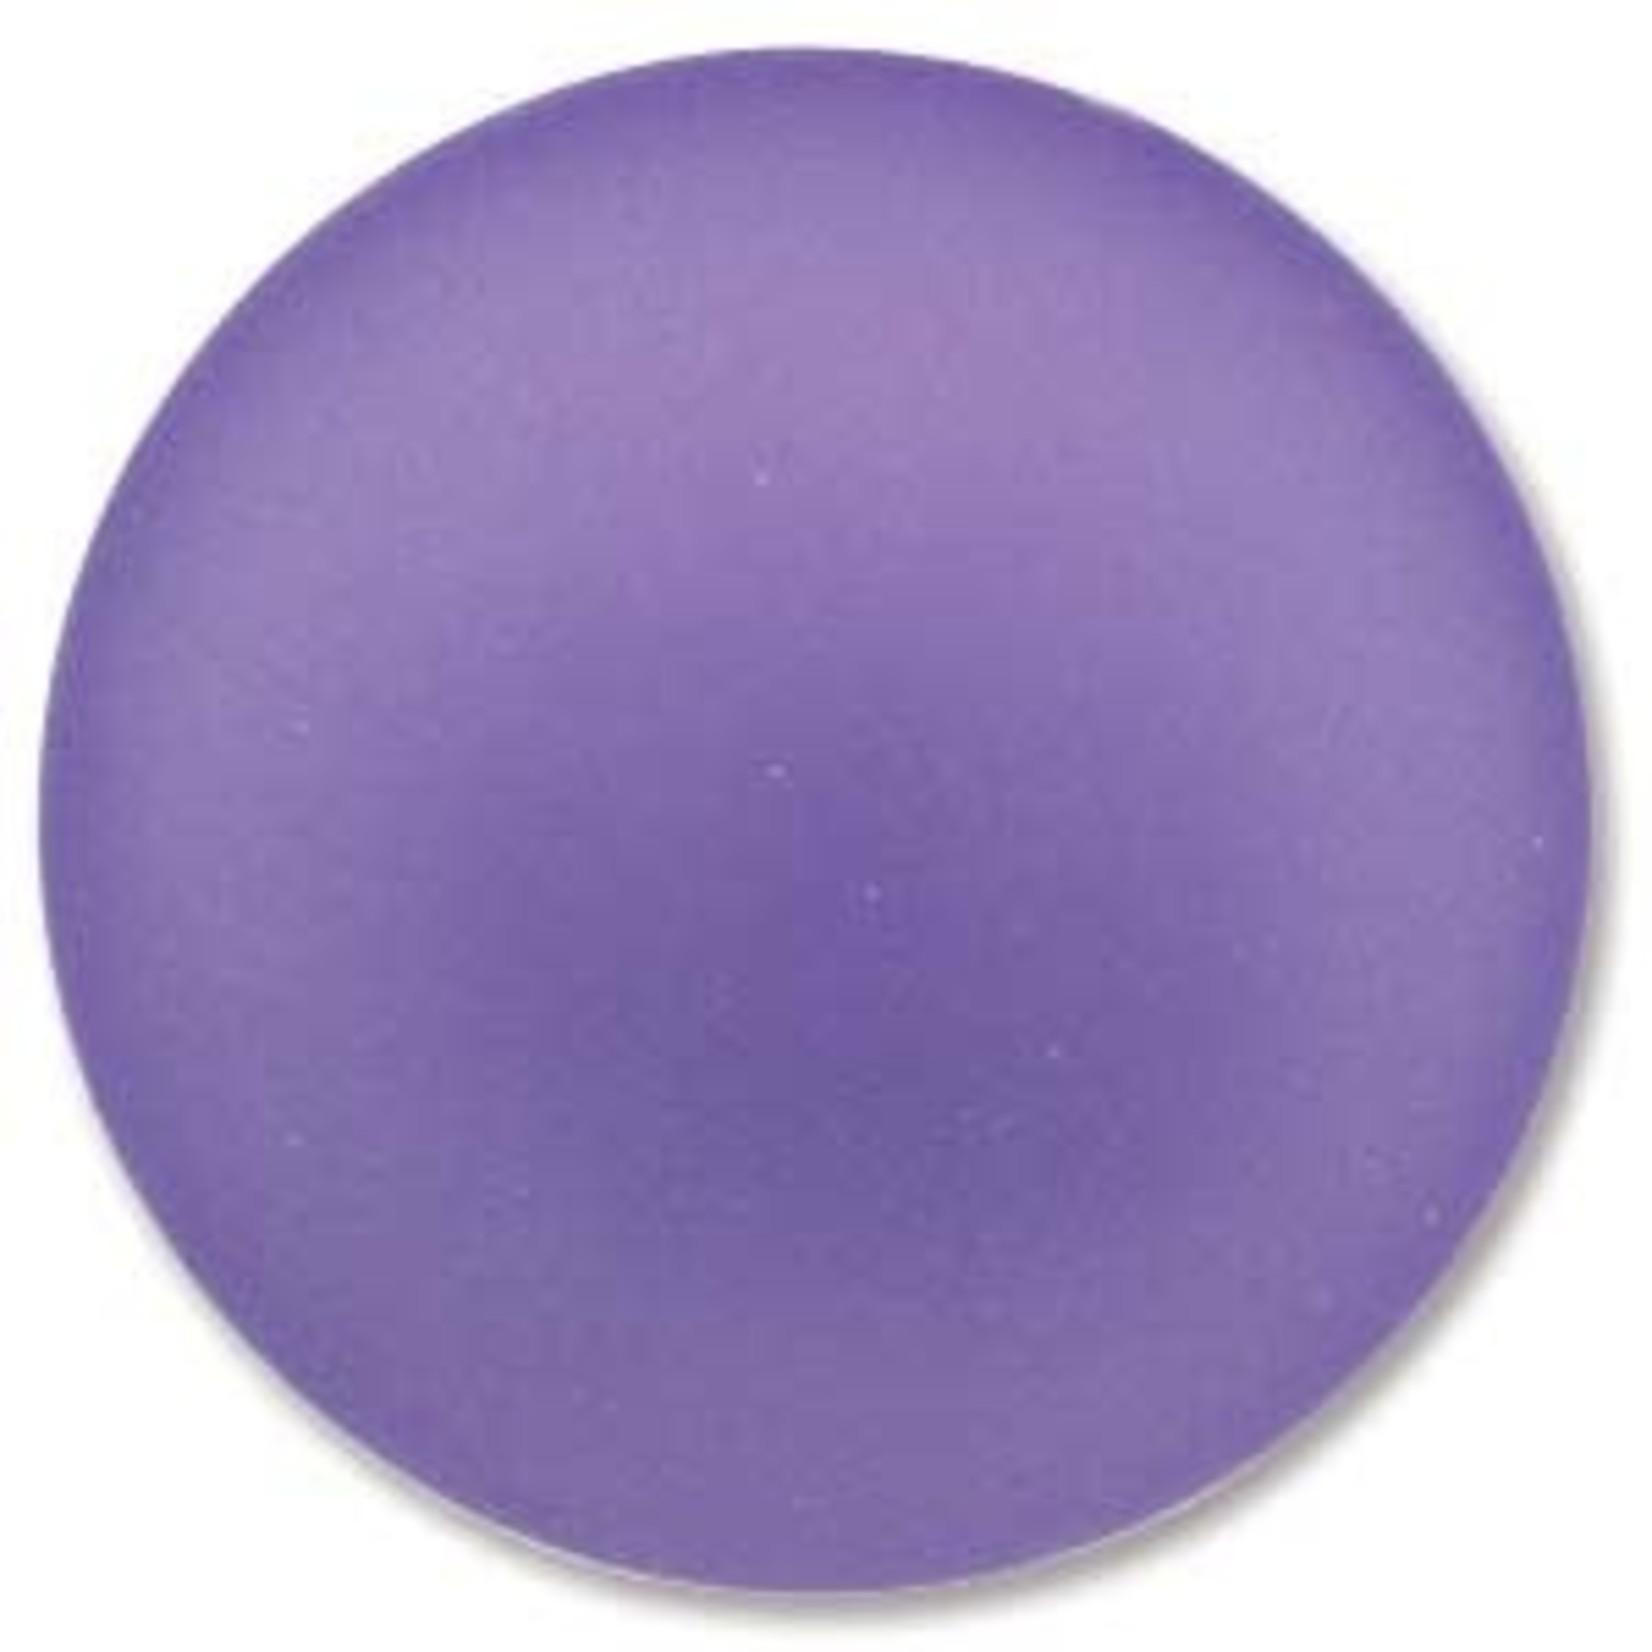 Lunasoft Cabochon Round 24mm Lavender